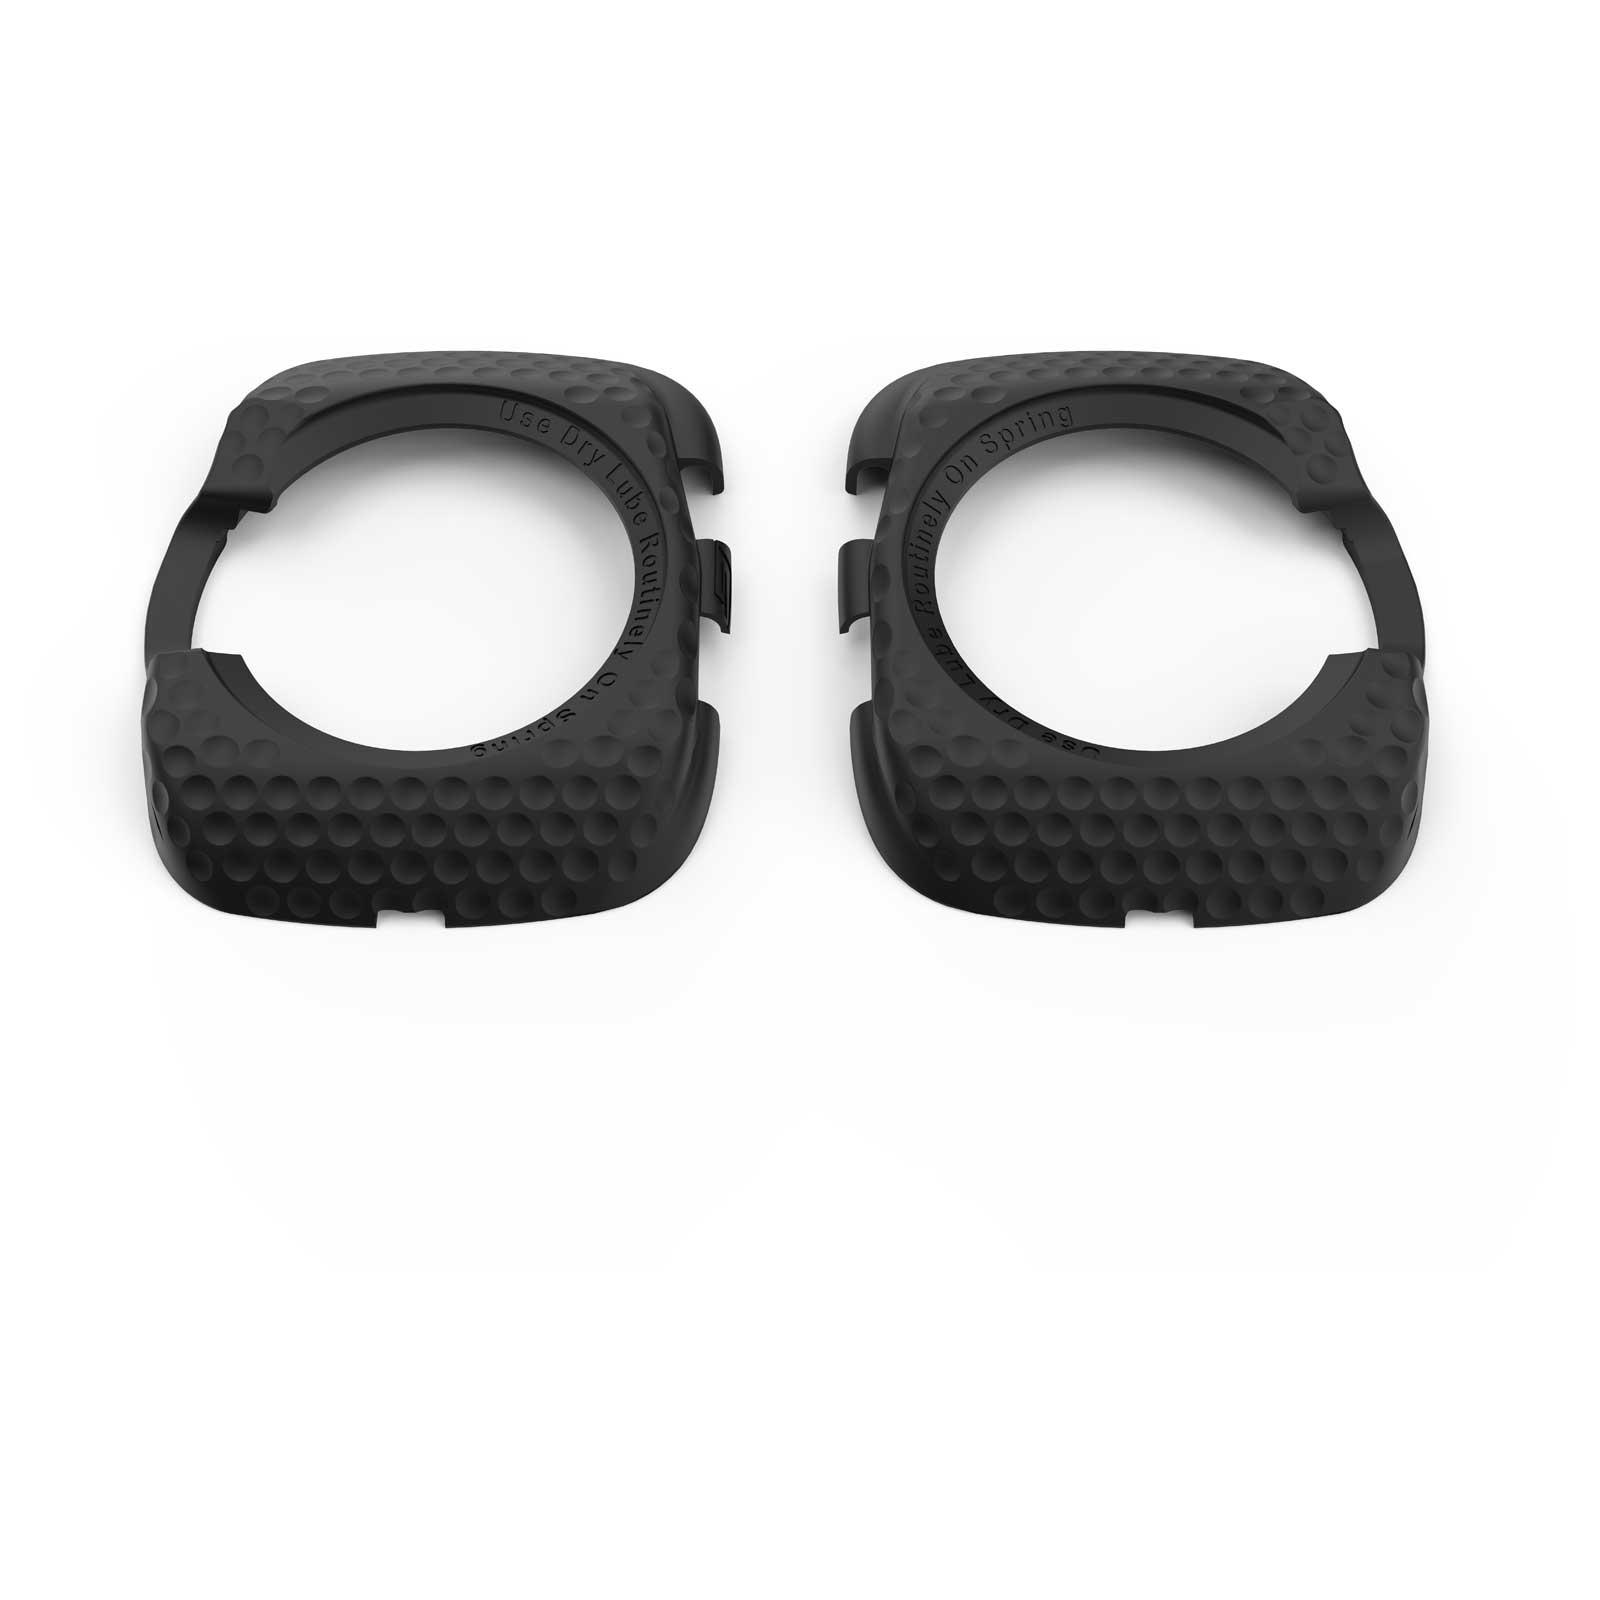 Wahoo SPEEDPLAY Cleat Cover Pedalplattenschutz - schwarz